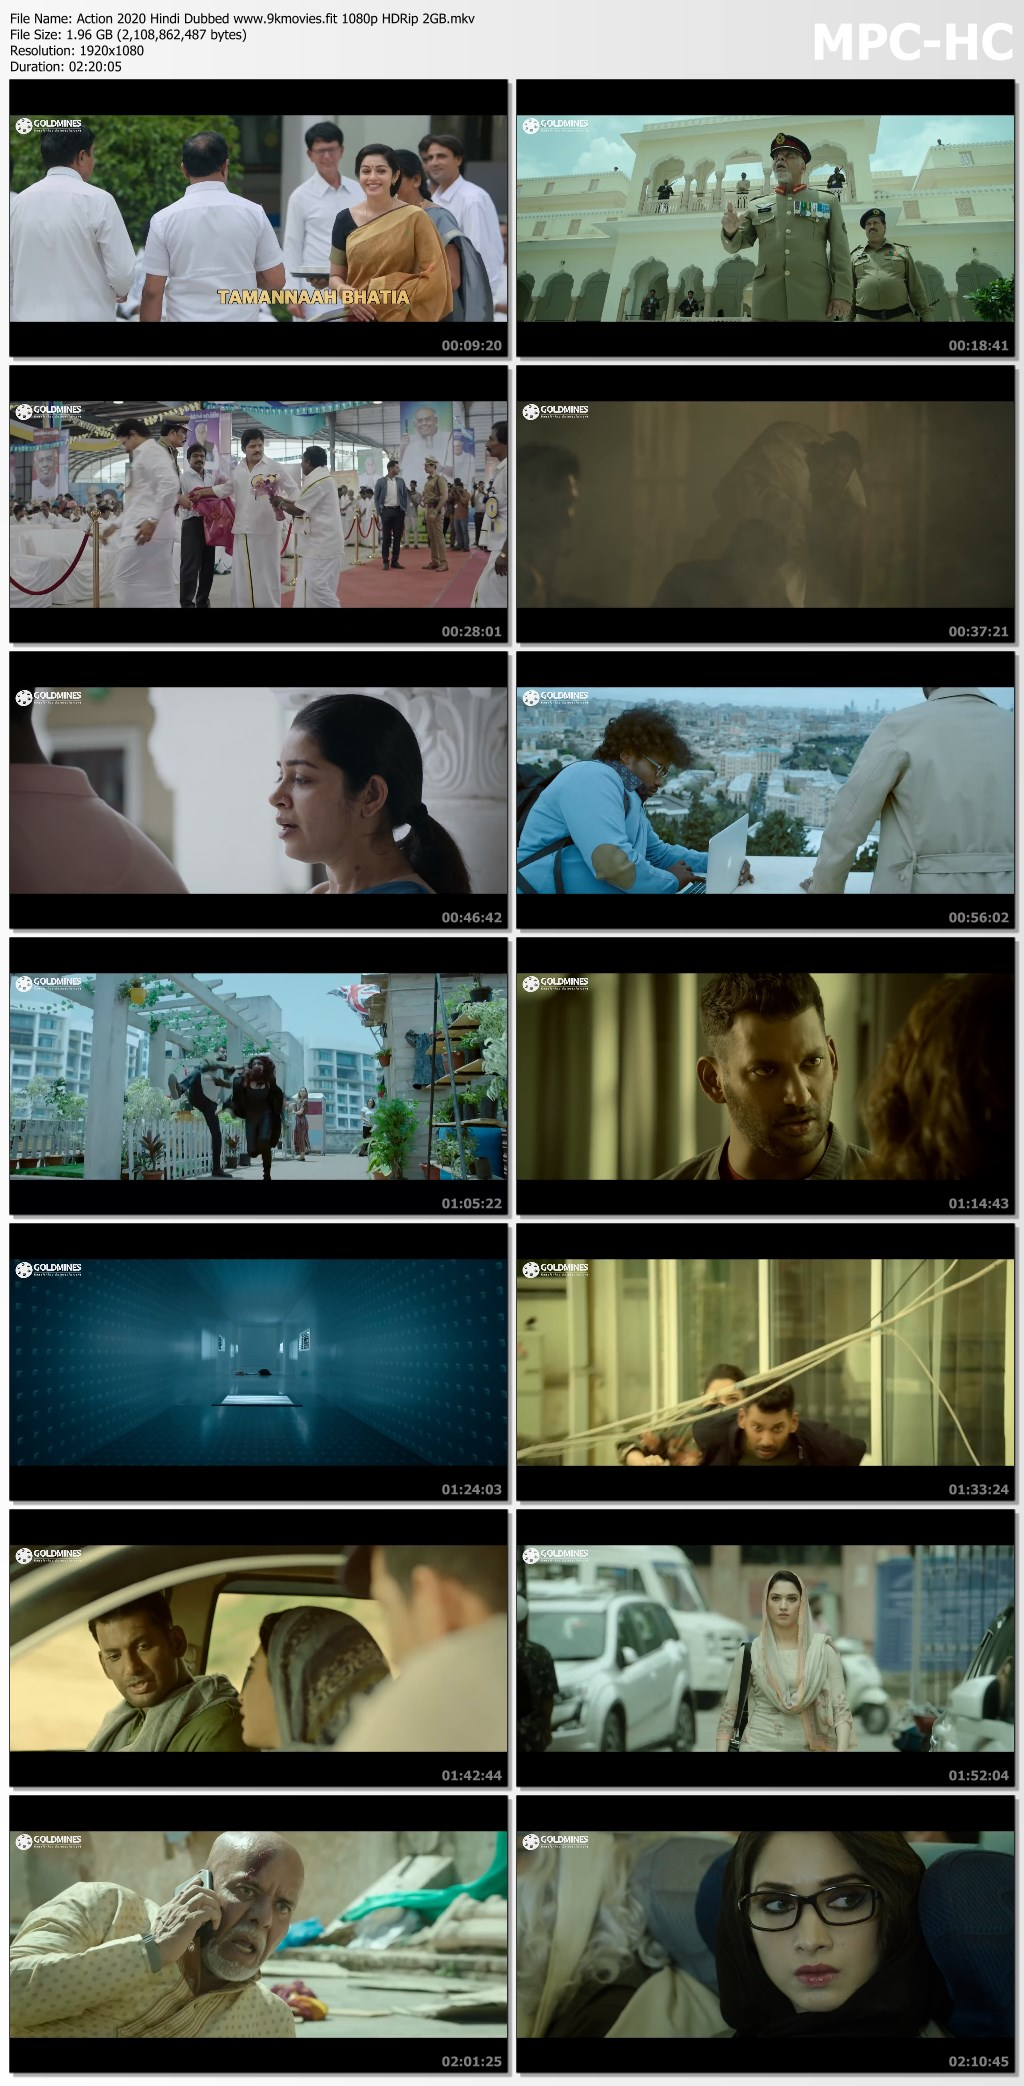 Download Action 2020 Hindi Dubbed 1080p HDRip 2GB